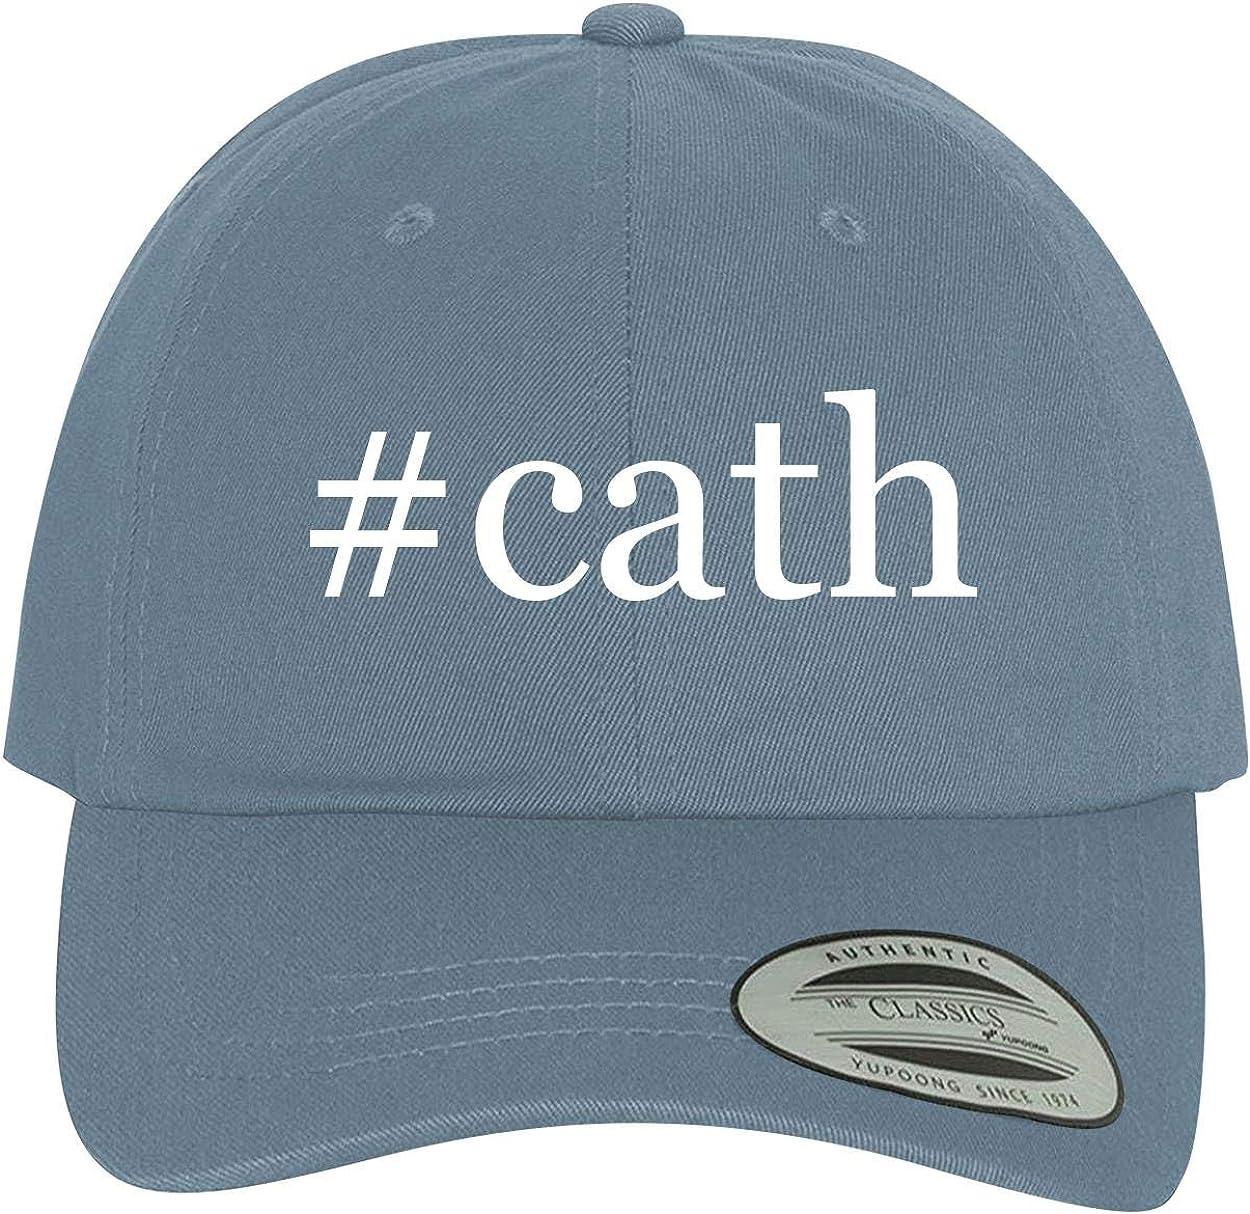 Comfortable Dad Hat Baseball Cap BH Cool Designs #Cath